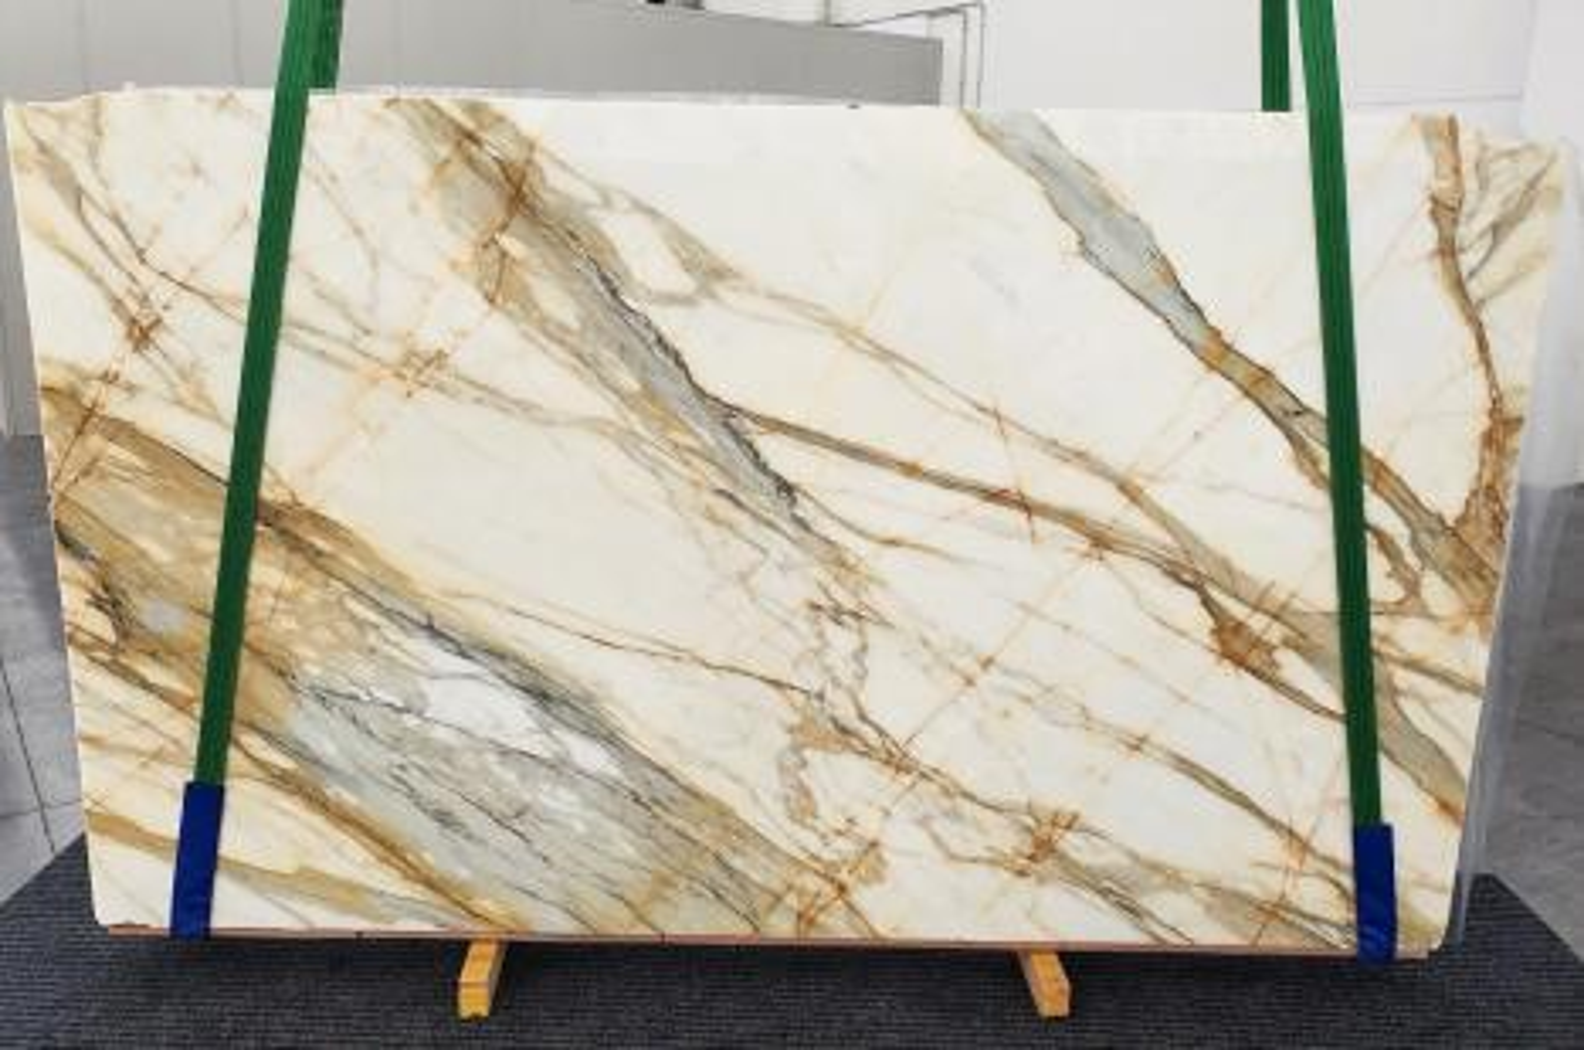 CALACATTA MACCHIAVECCHIA Suministro (Italia) de planchas pulidas en mármol natural 1272 , Slab #54